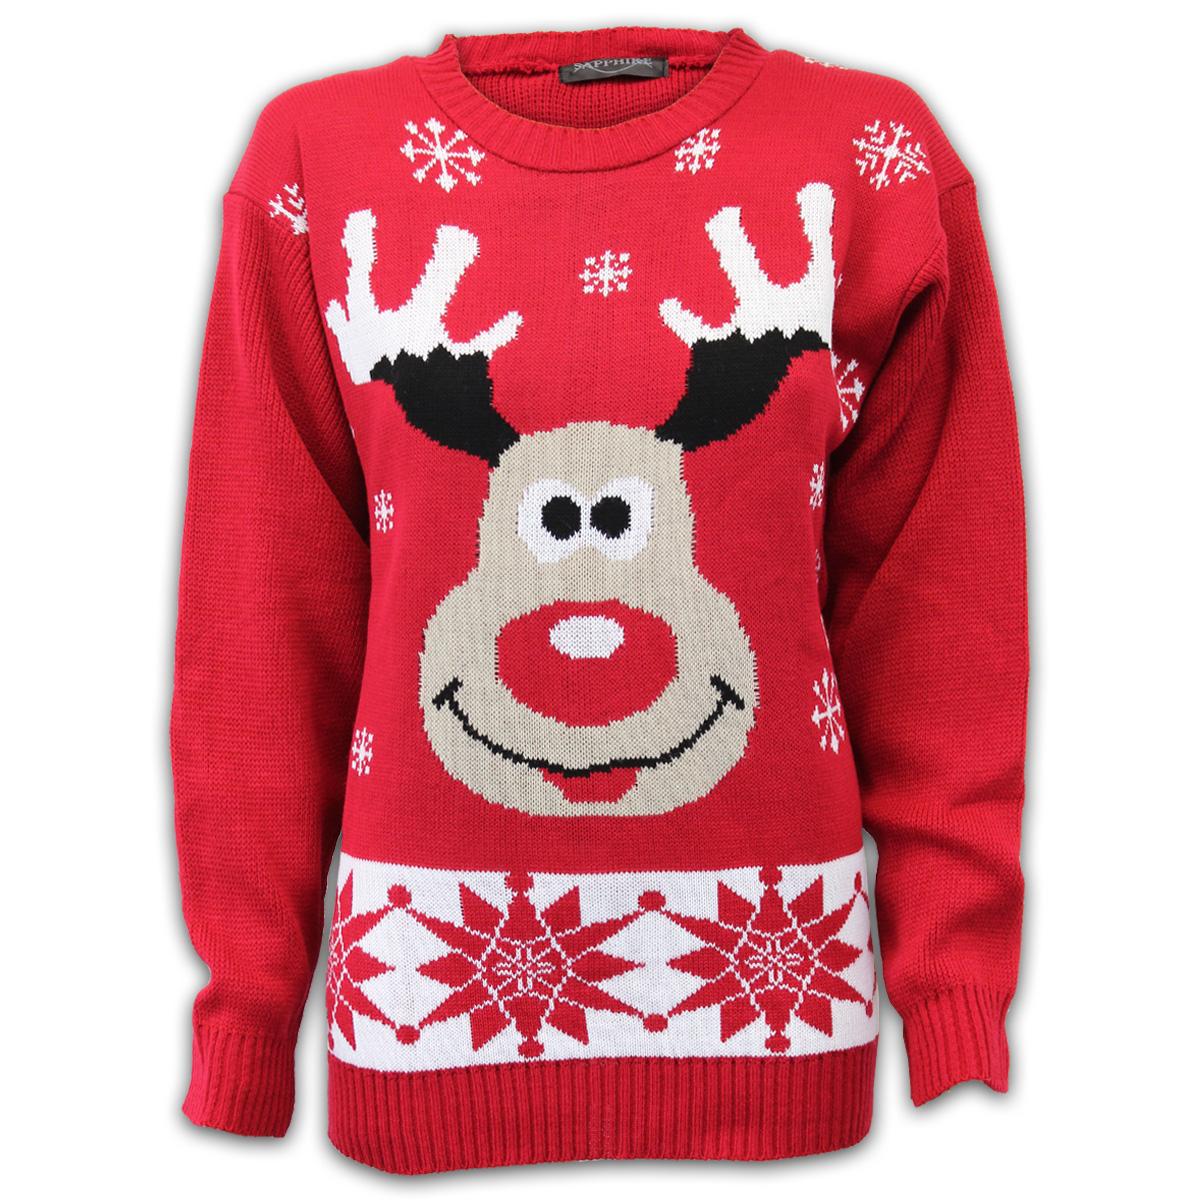 Mens Christmas Jumper Threadbare Xmas Knitted Snowman Santa Novelty Sweater N...